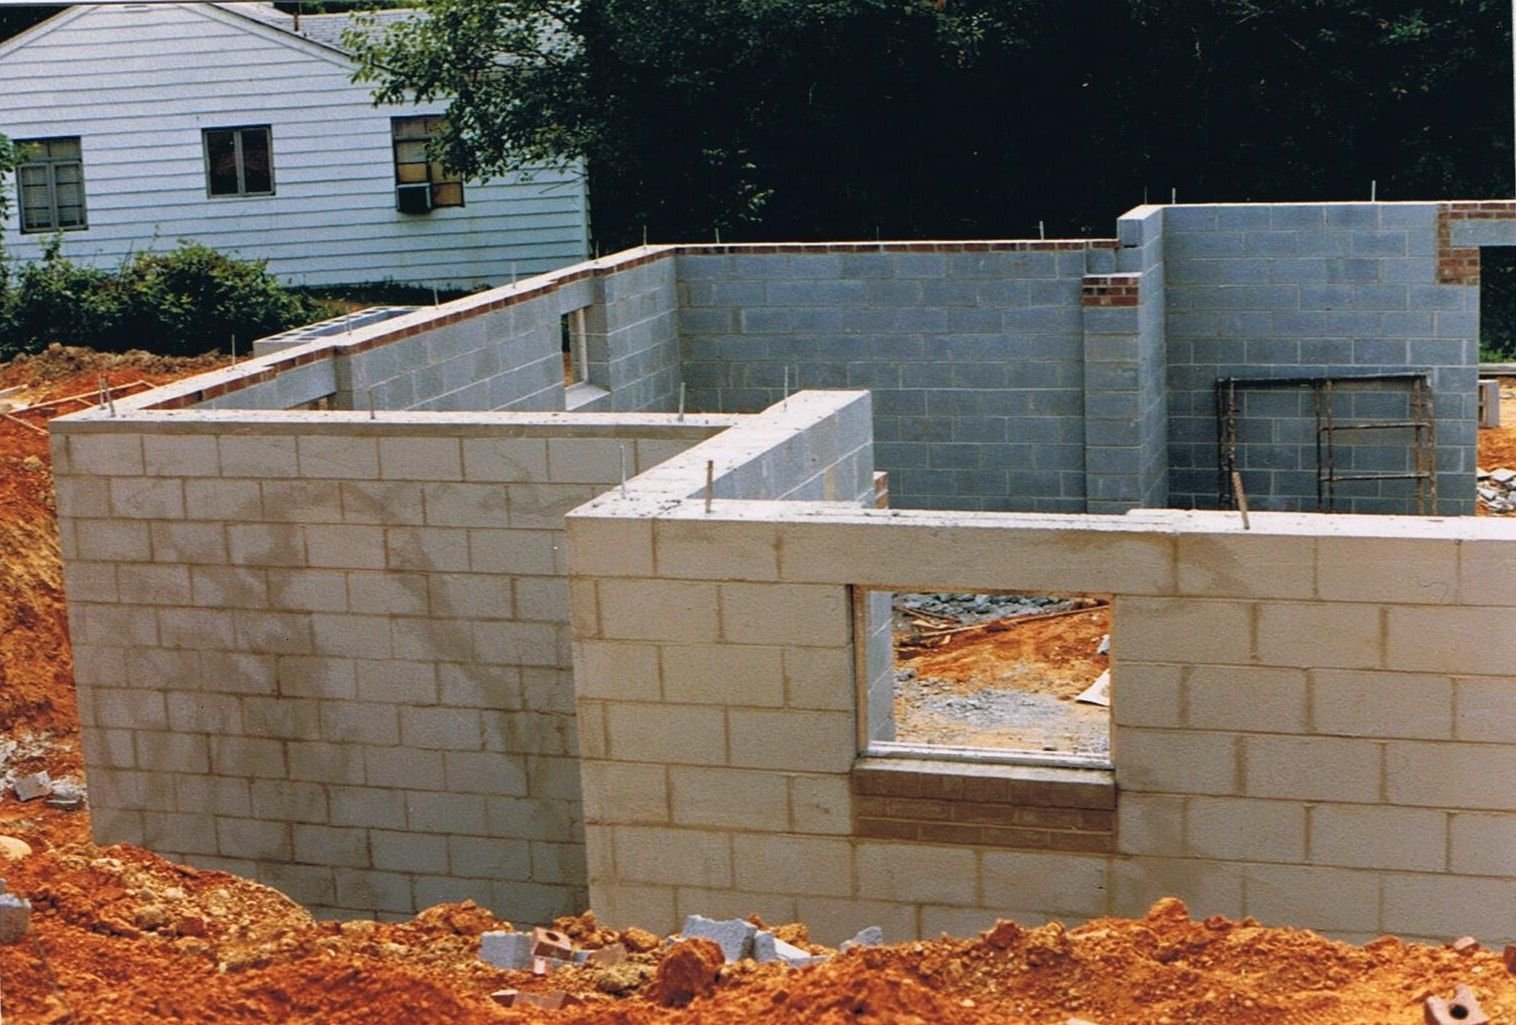 Concrete Block Repair How To Repair Foundation Cracks Concrete Blocks Concrete Block Foundation Cinder Block House